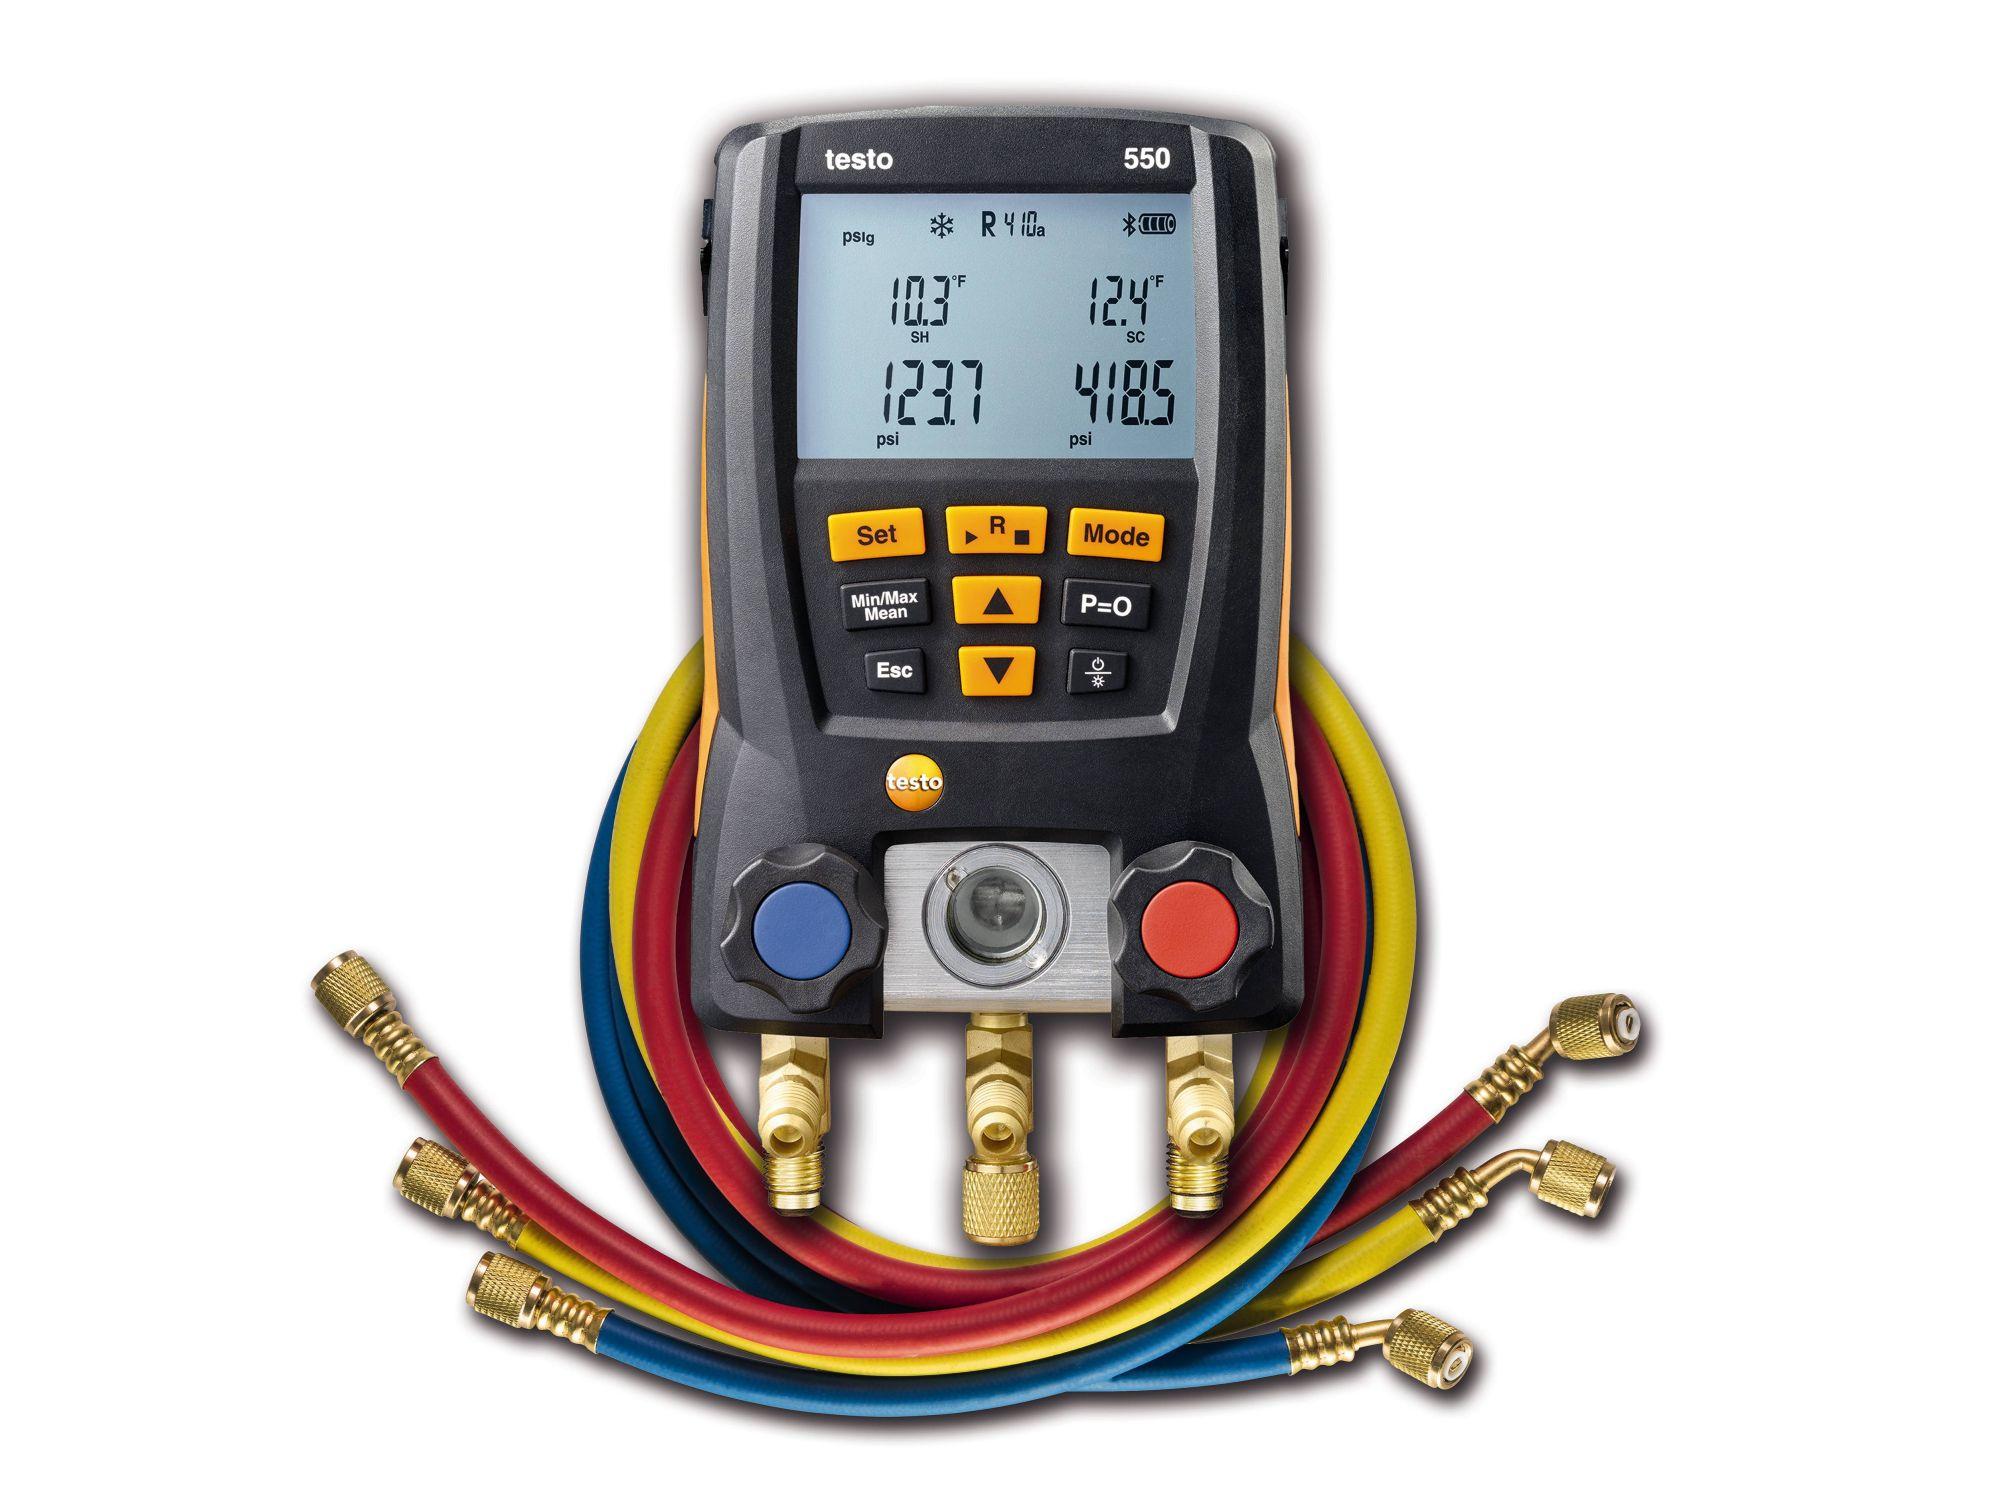 Testo 550 Refrigeration Digital Manifold Meter Kit 0563 1550 with Clamp Probes